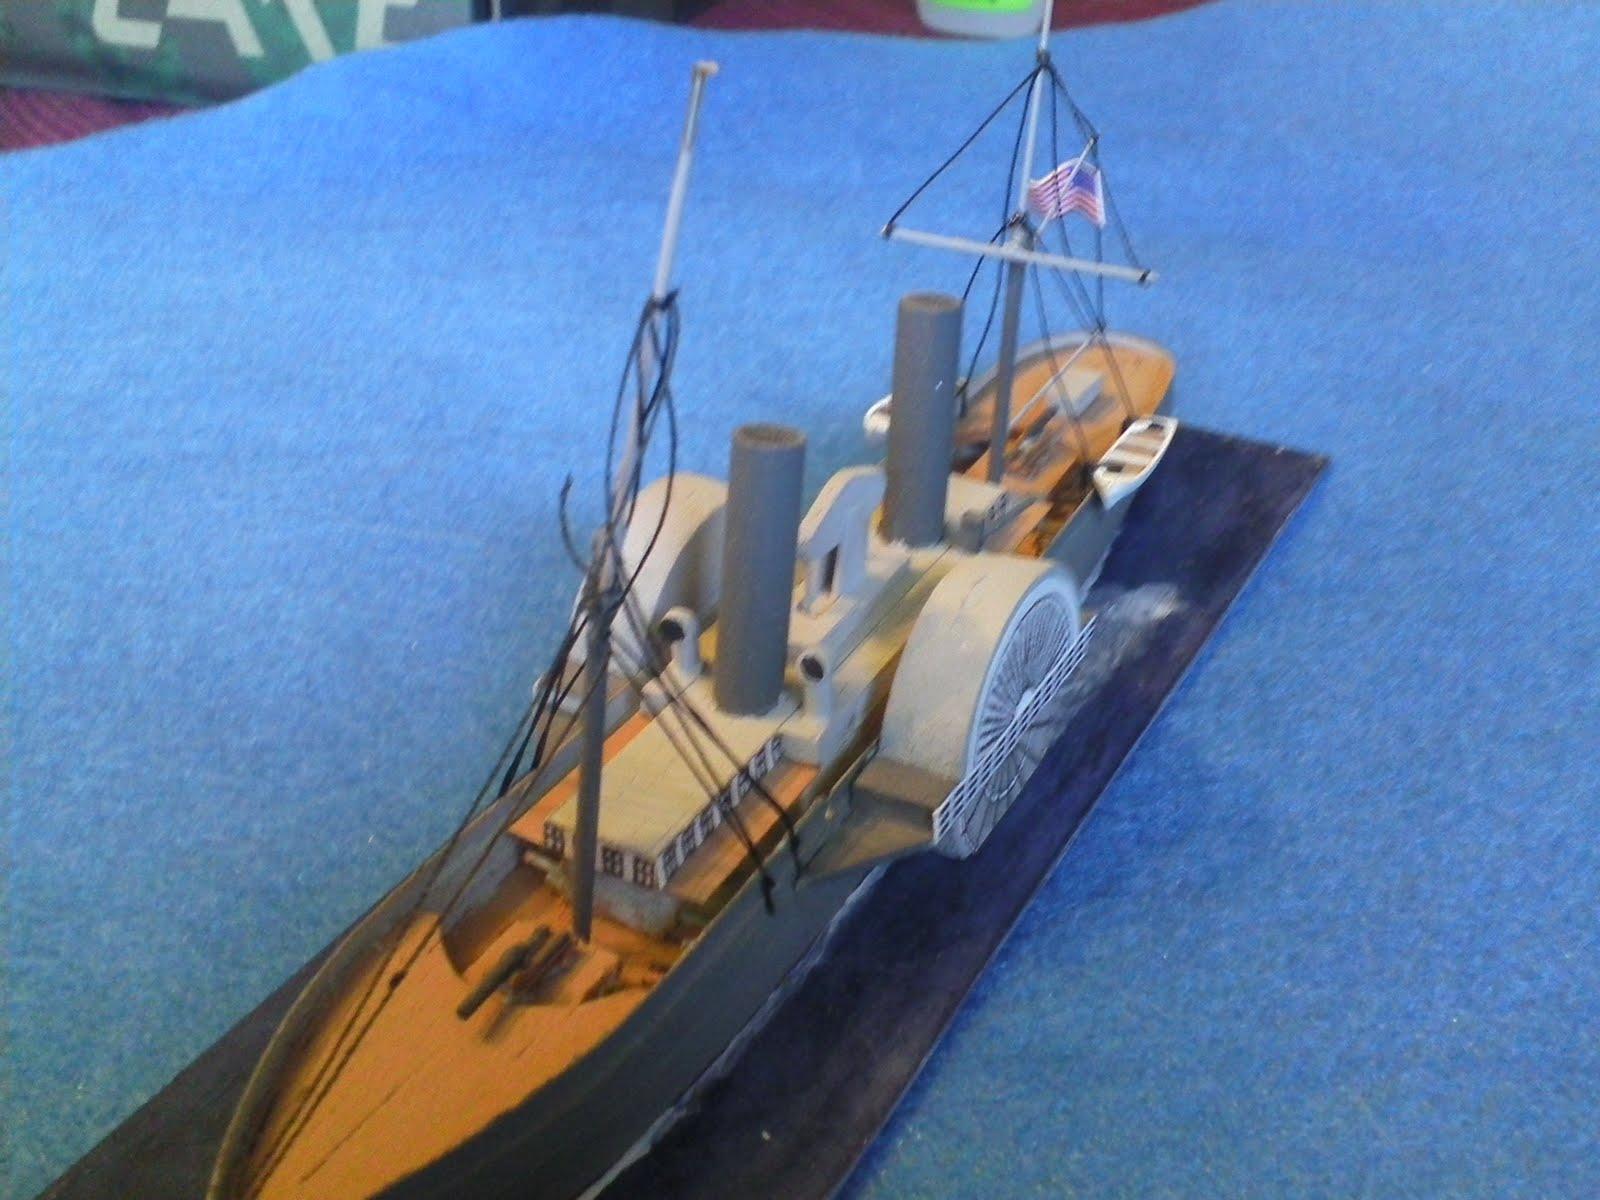 Sail and steam navies